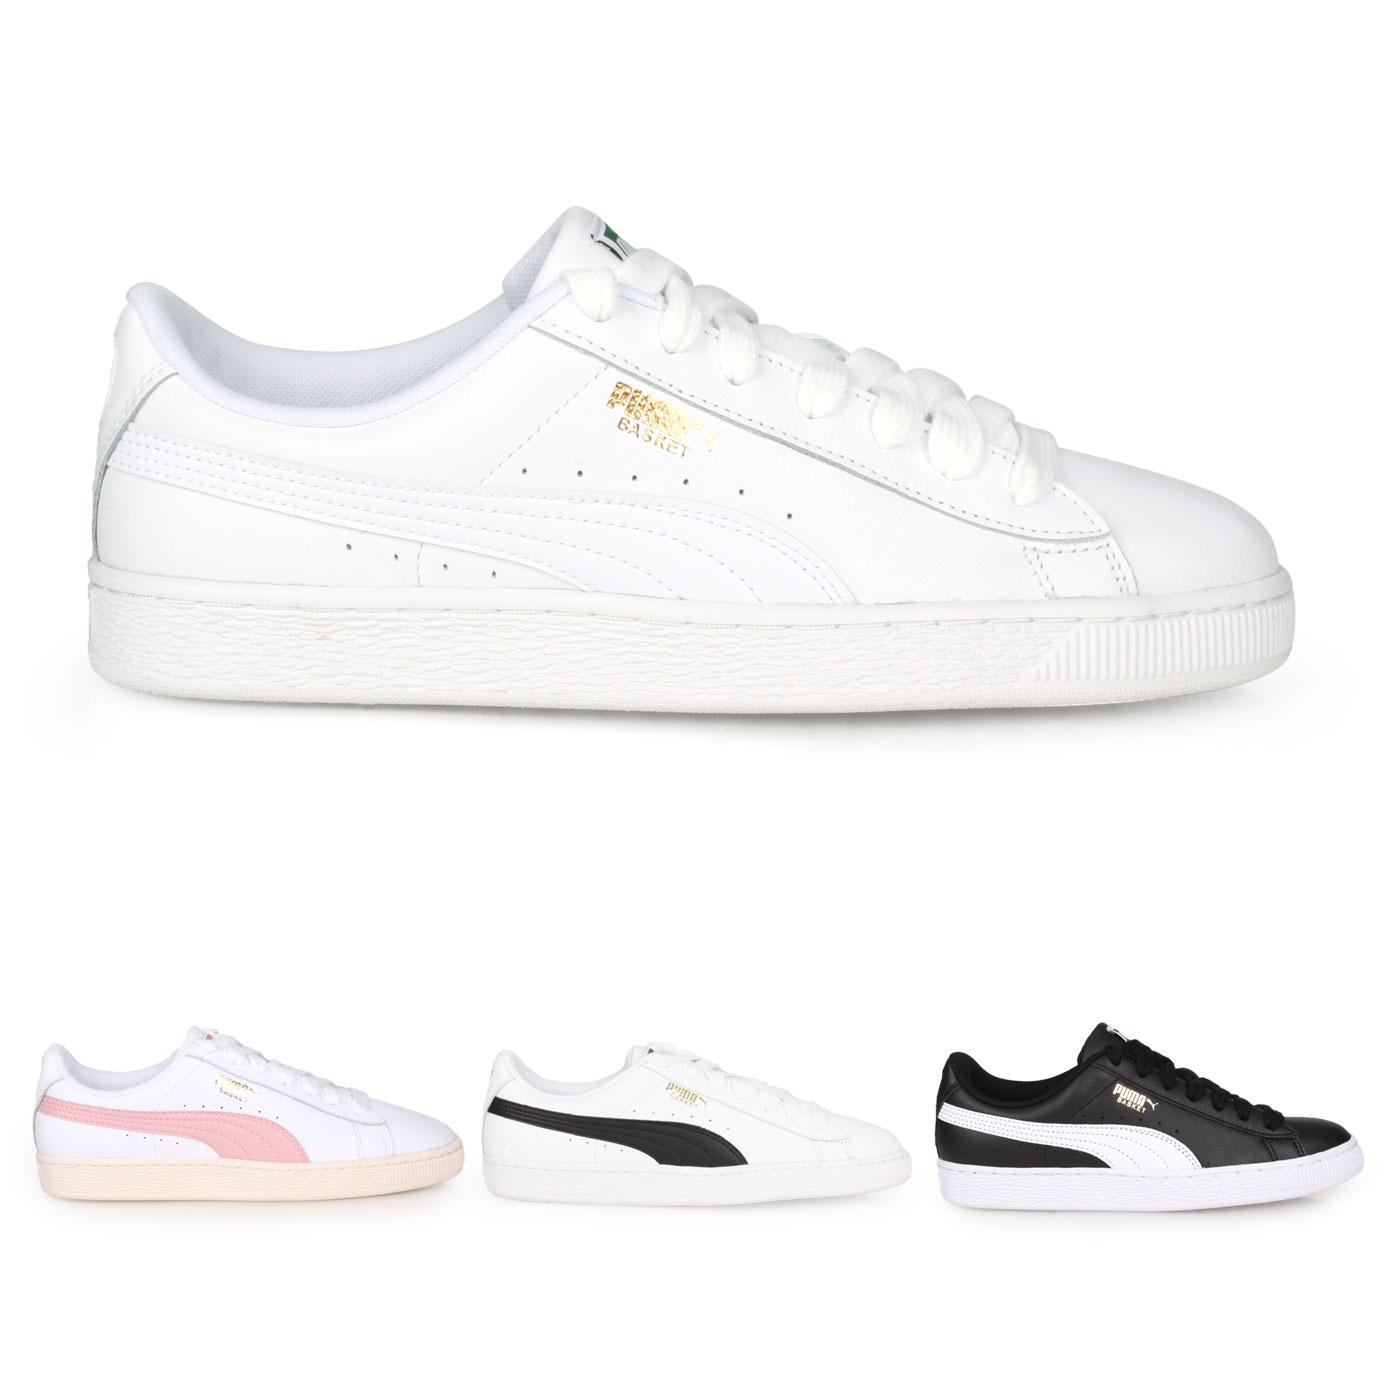 PUMA 經典復古休閒鞋  @BASKET CLASSIC LFS@35436717